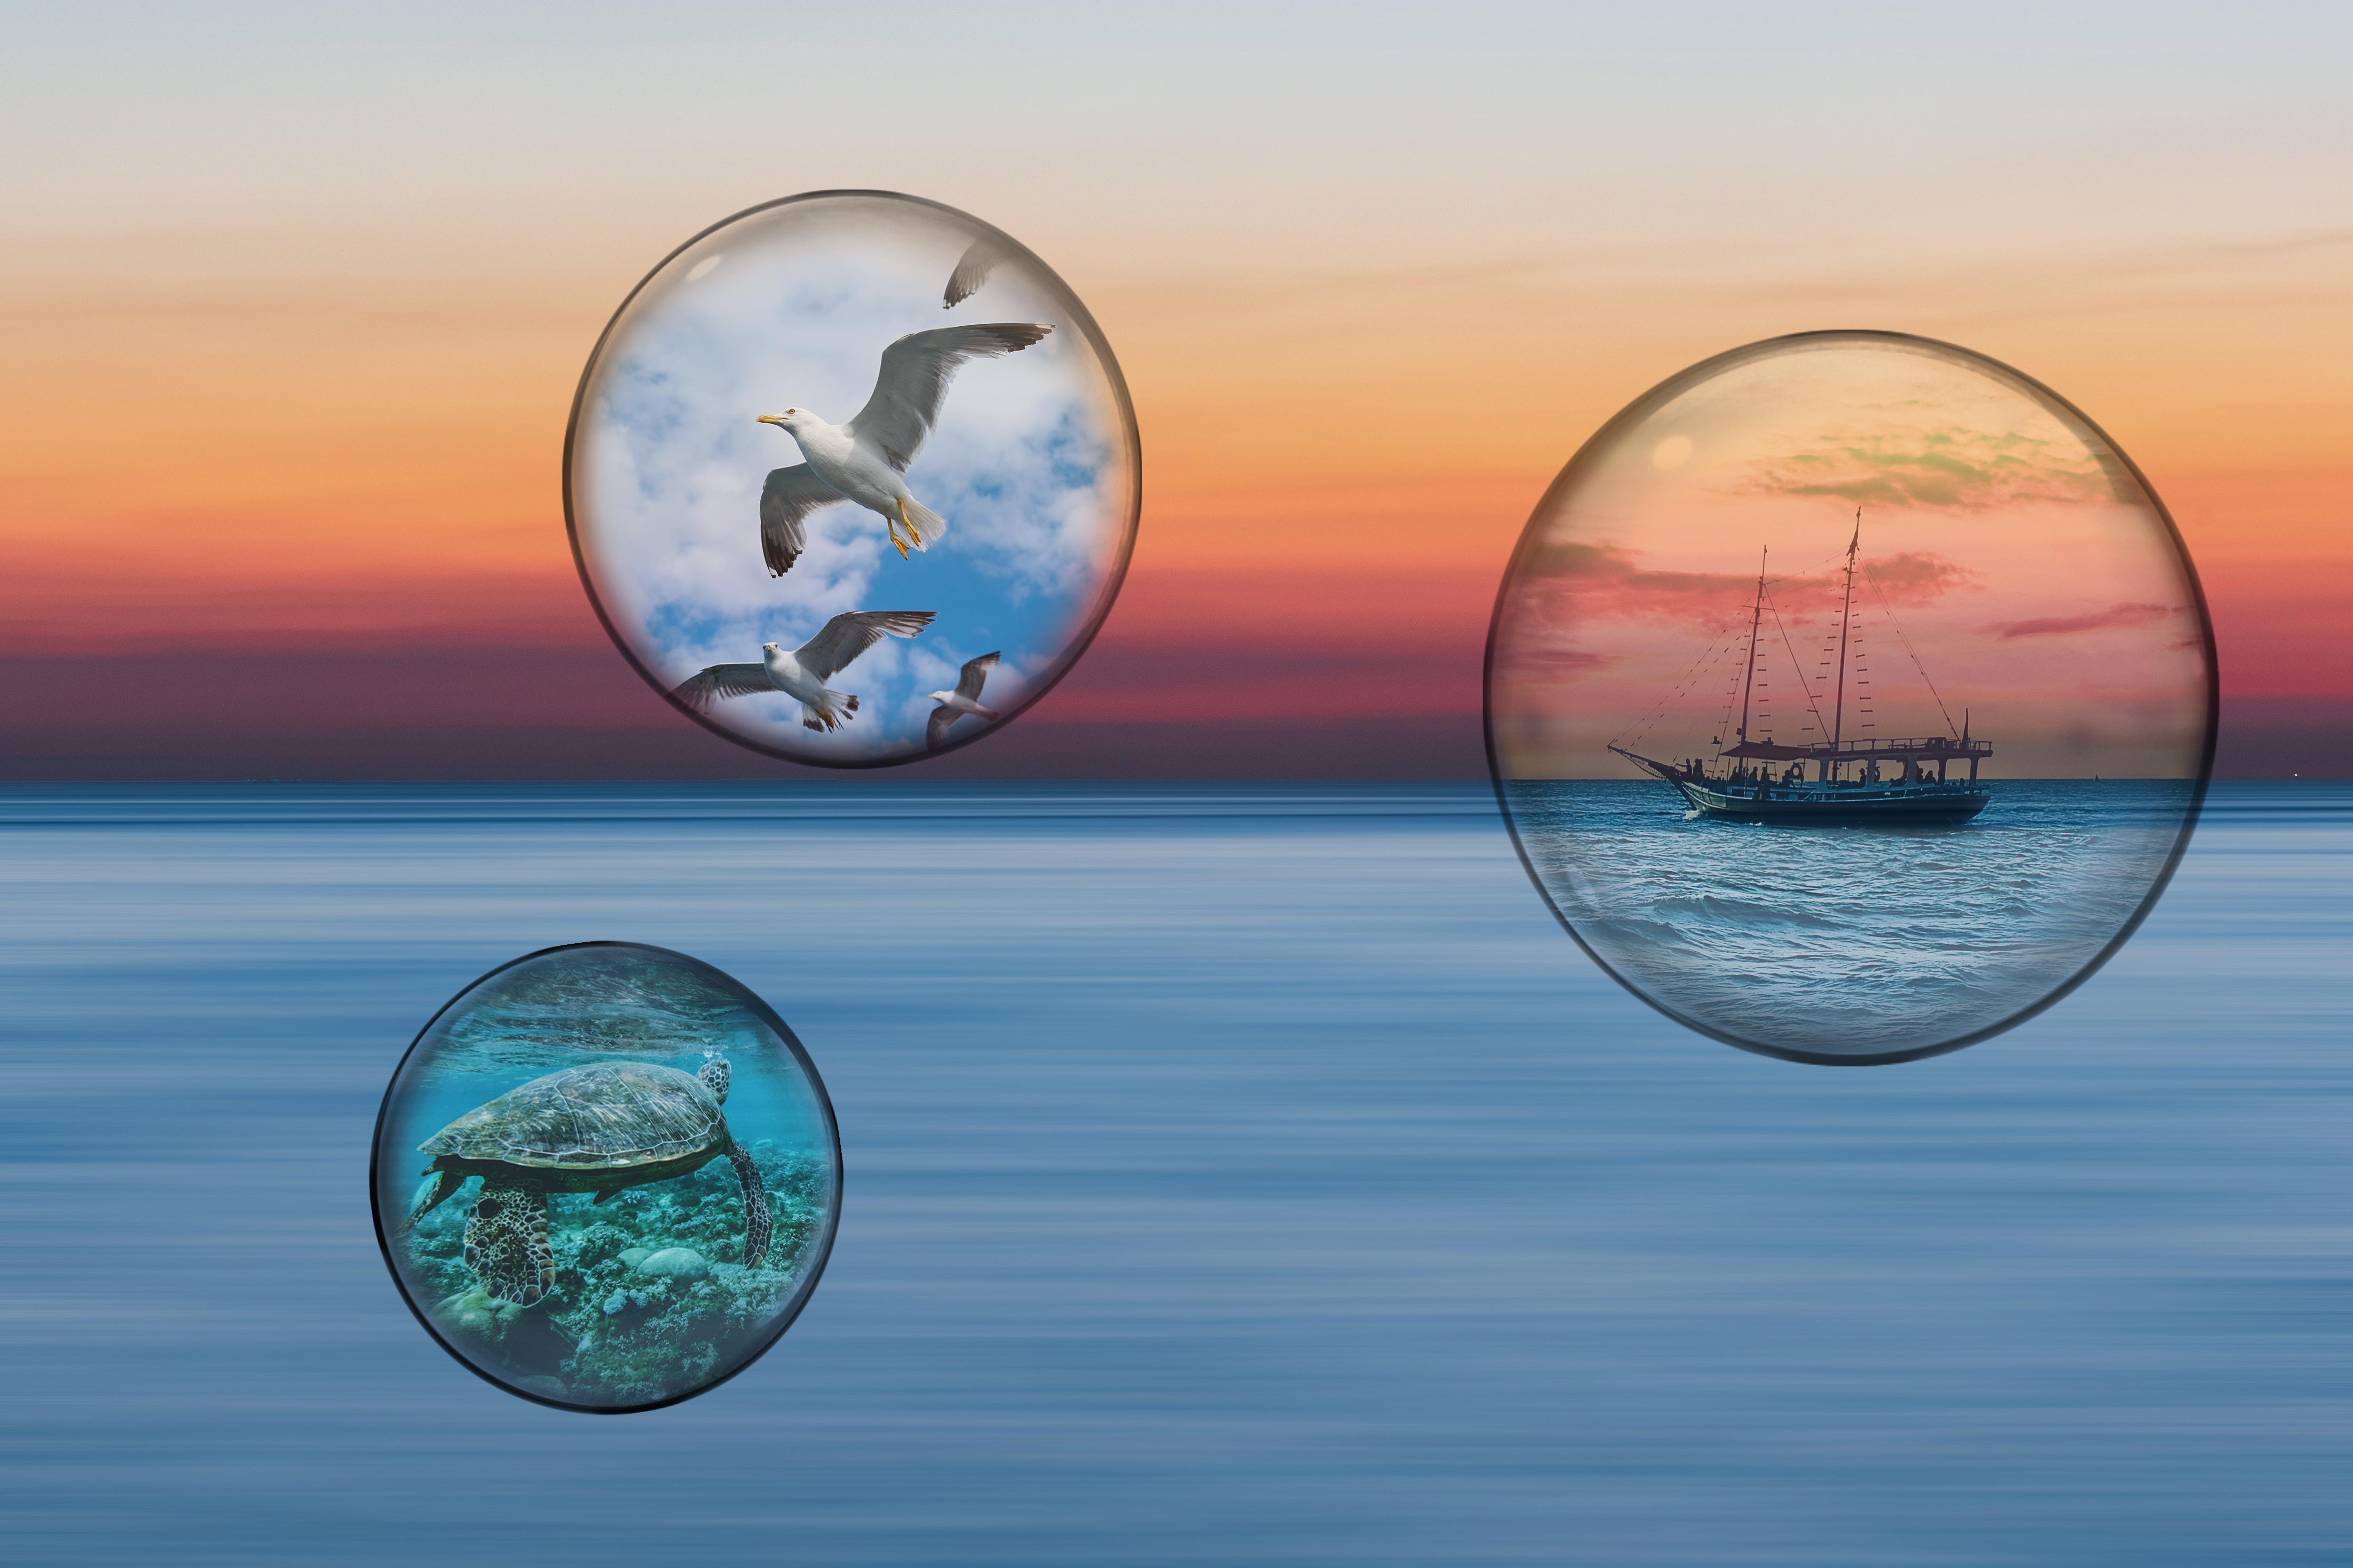 Sunset Sky Bubble Project